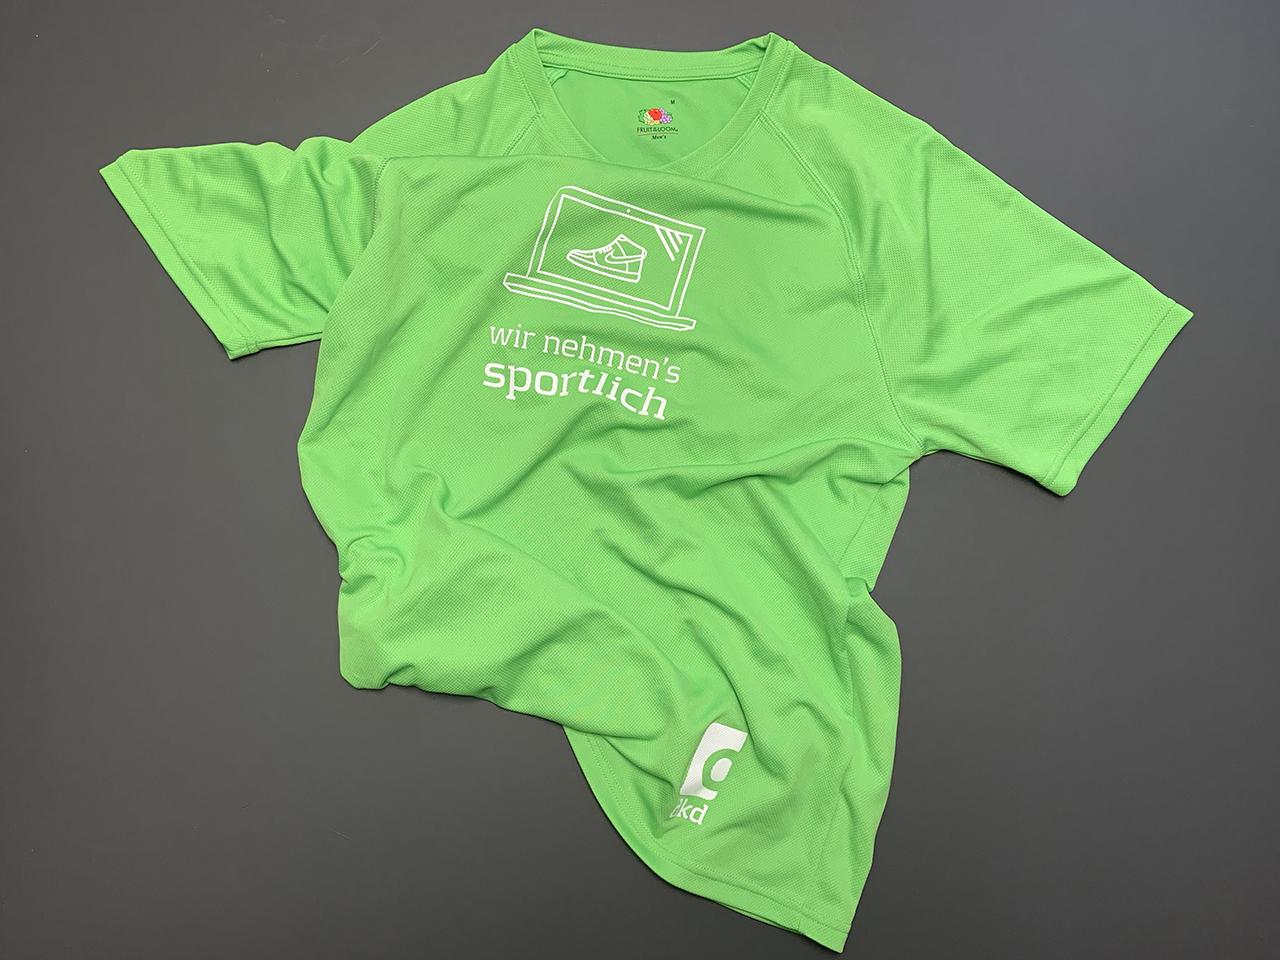 Grünes JP Morgan Funktionsshirt